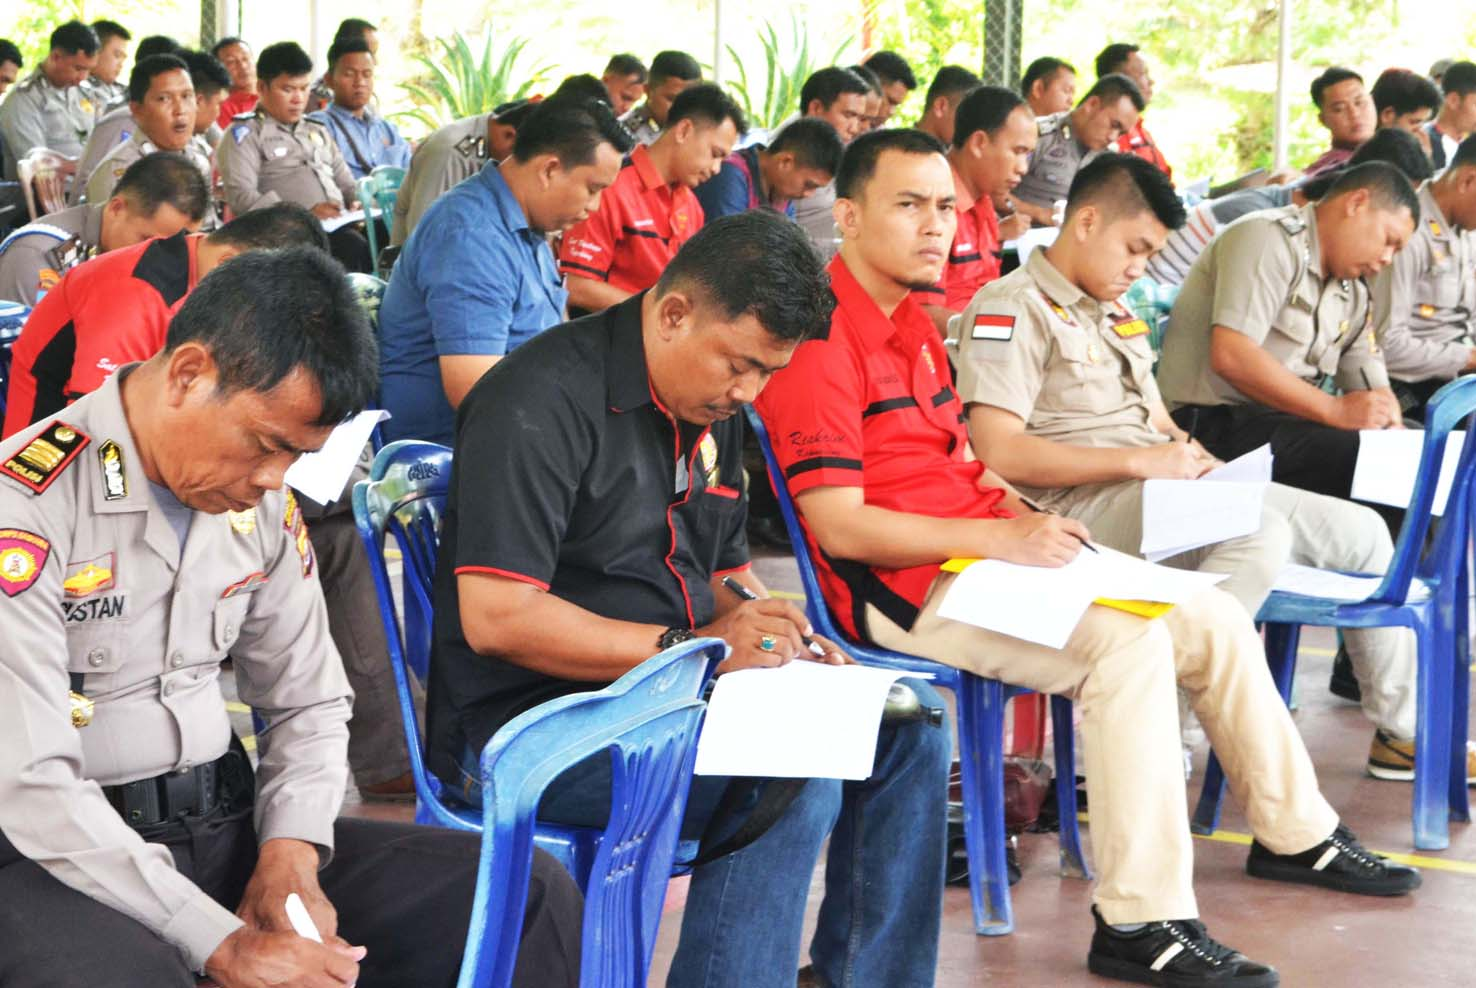 Menjamin  Kelayakan Polisi Pegang Senpi,  200 Anggota Polres Kepahiang Jalani Test Psikologi